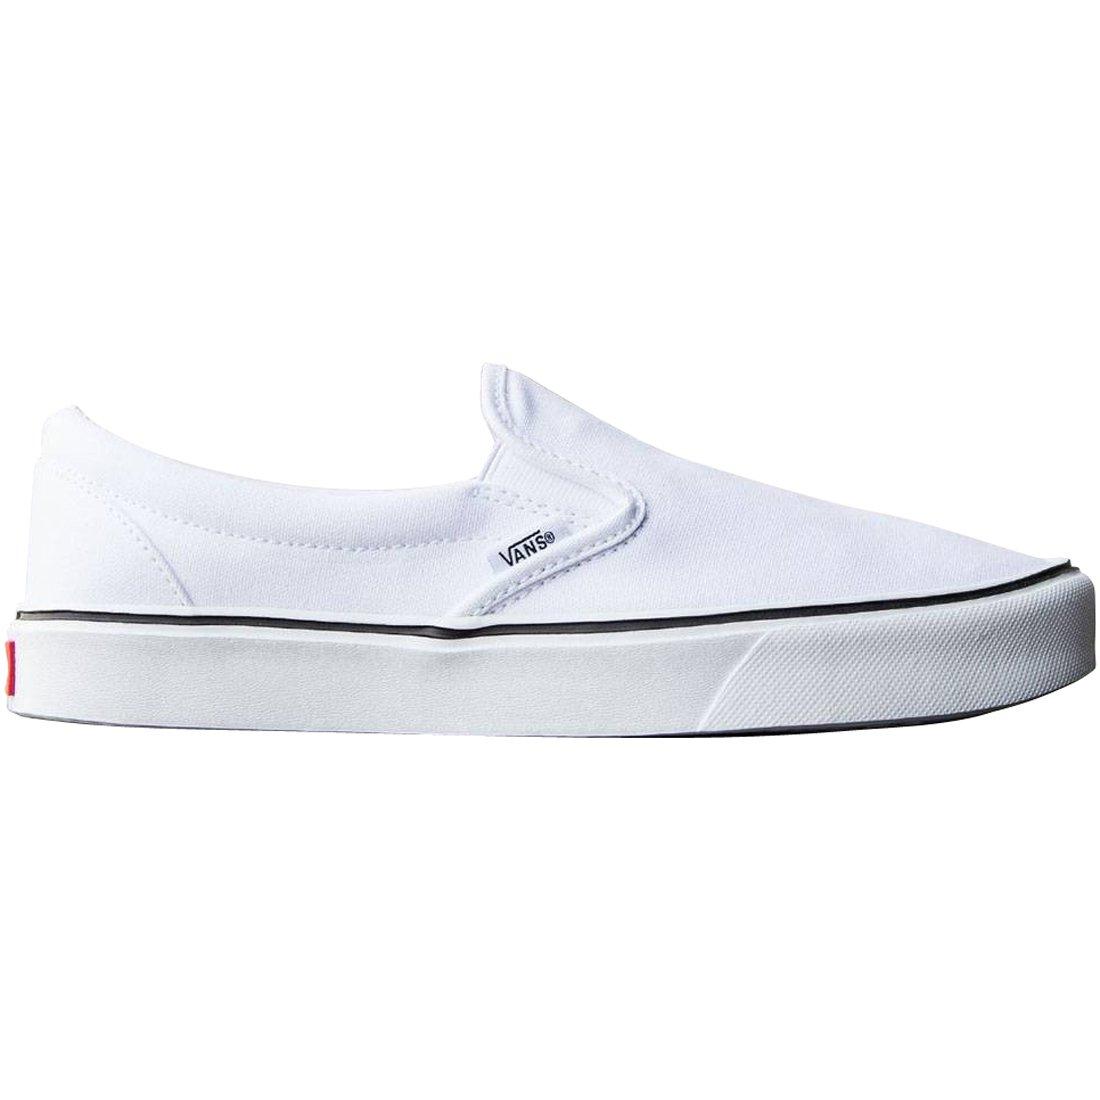 Vans Slip-On Lite Plus - Scarpe da Ginnastica Basse – Unisex – Basse Adulto, Nero (Canvas/Black/Black), 34.5 EU Bianco (Canvas/True White) 4c3223